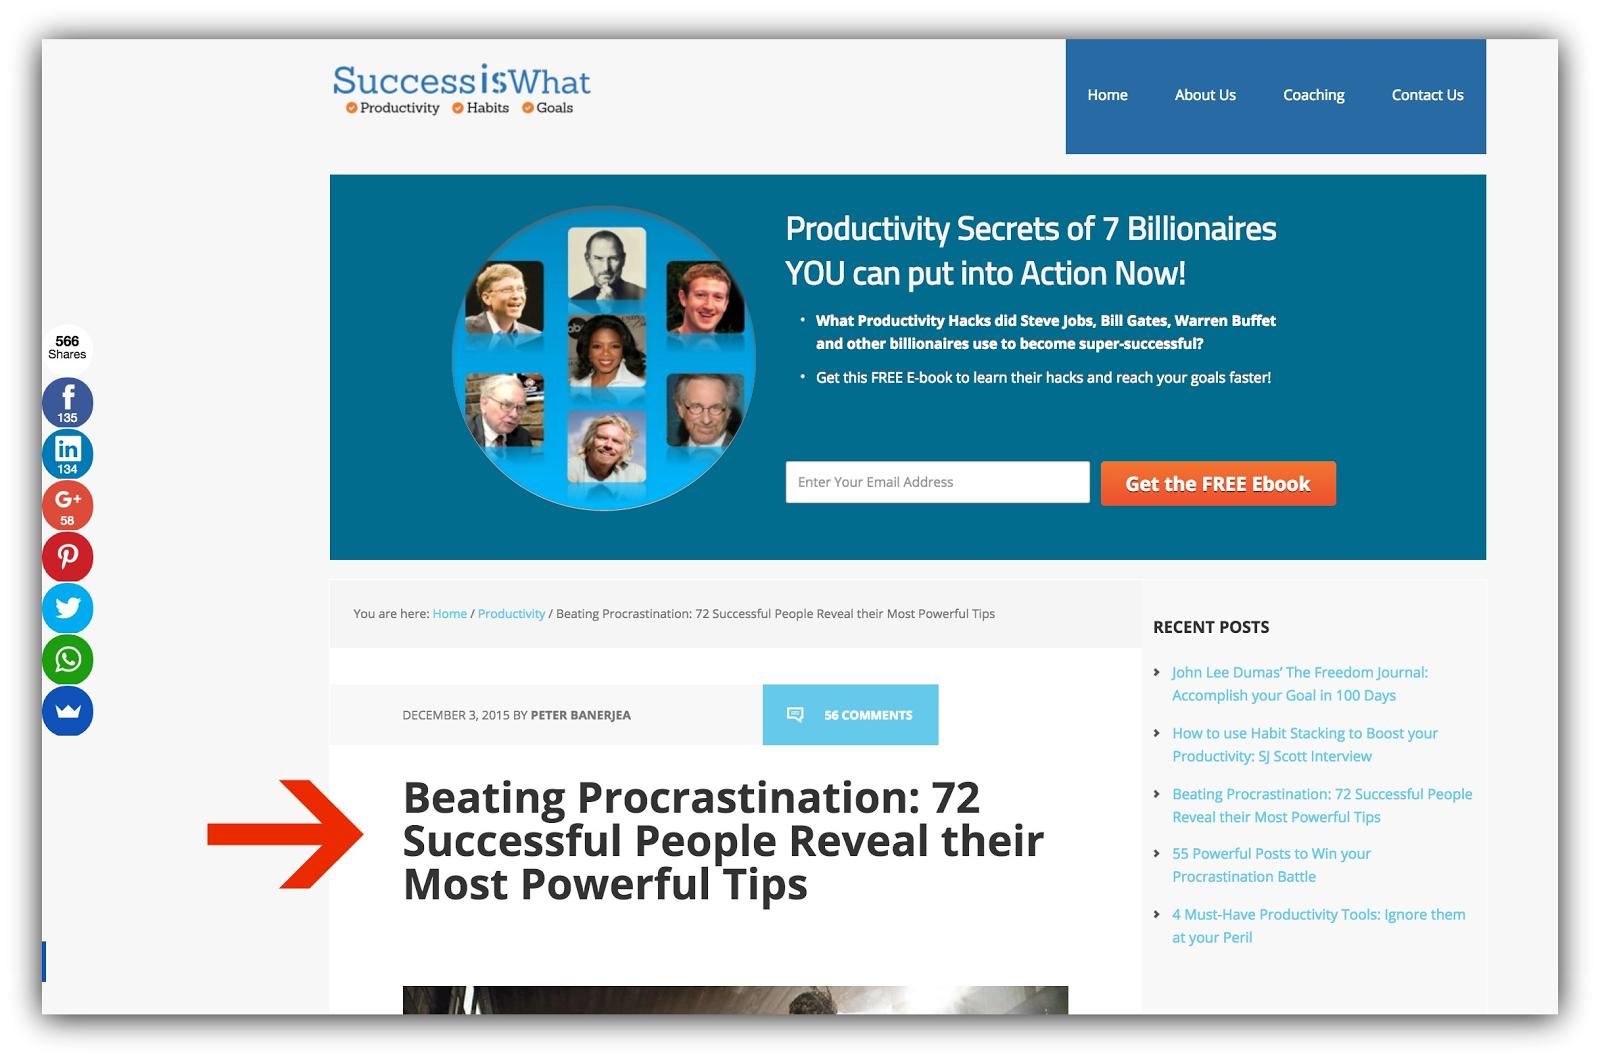 success is what beat procrastination